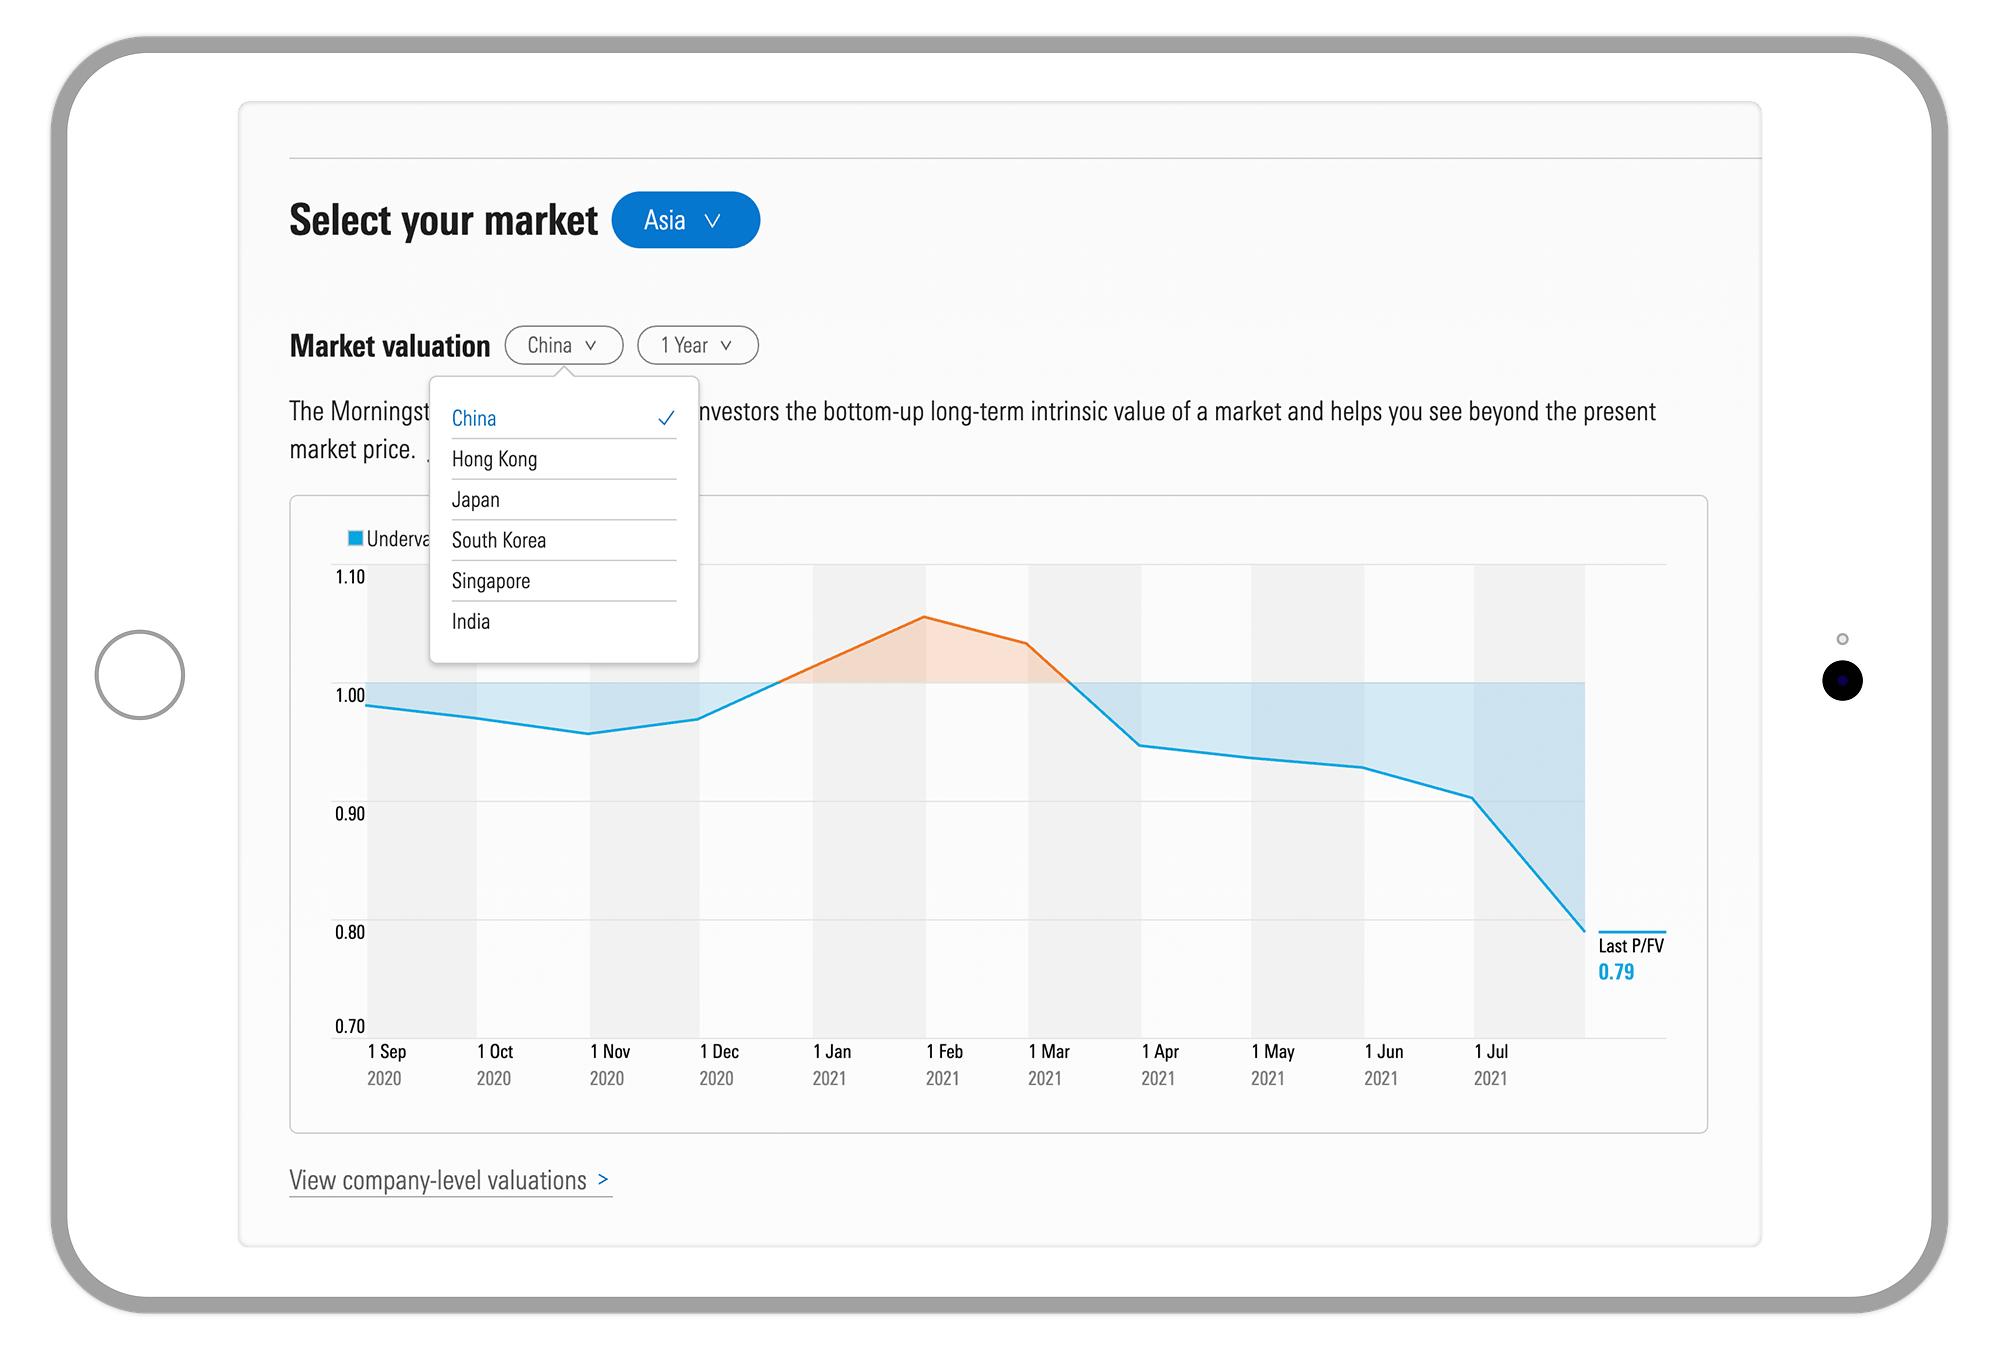 Morningstar's market price-to-fair-value chart